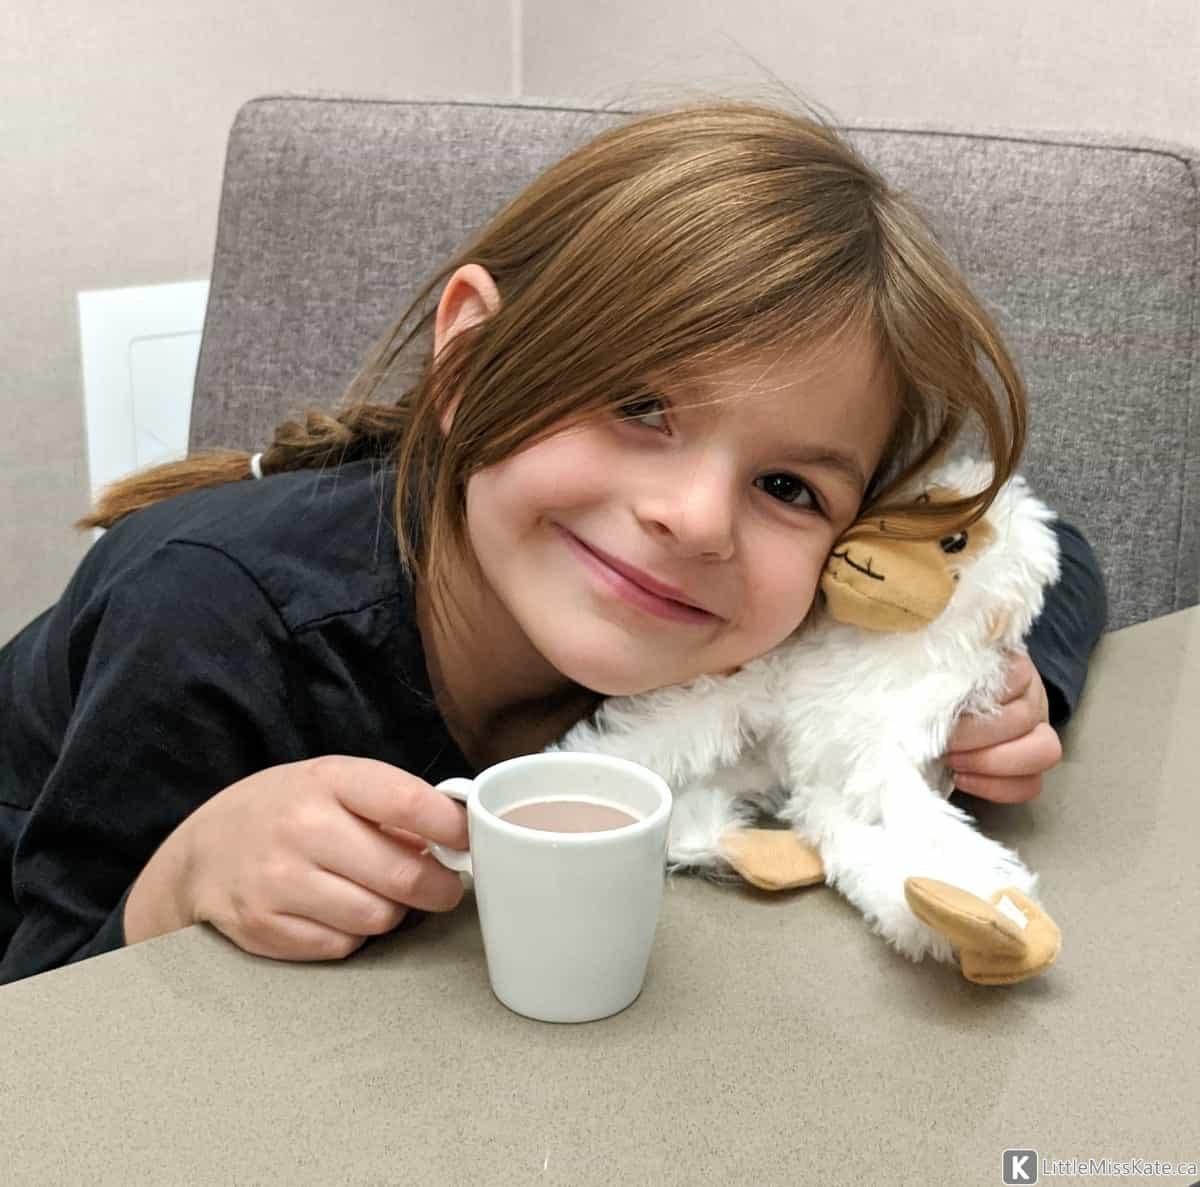 Best Hotel for Kids in Toronto